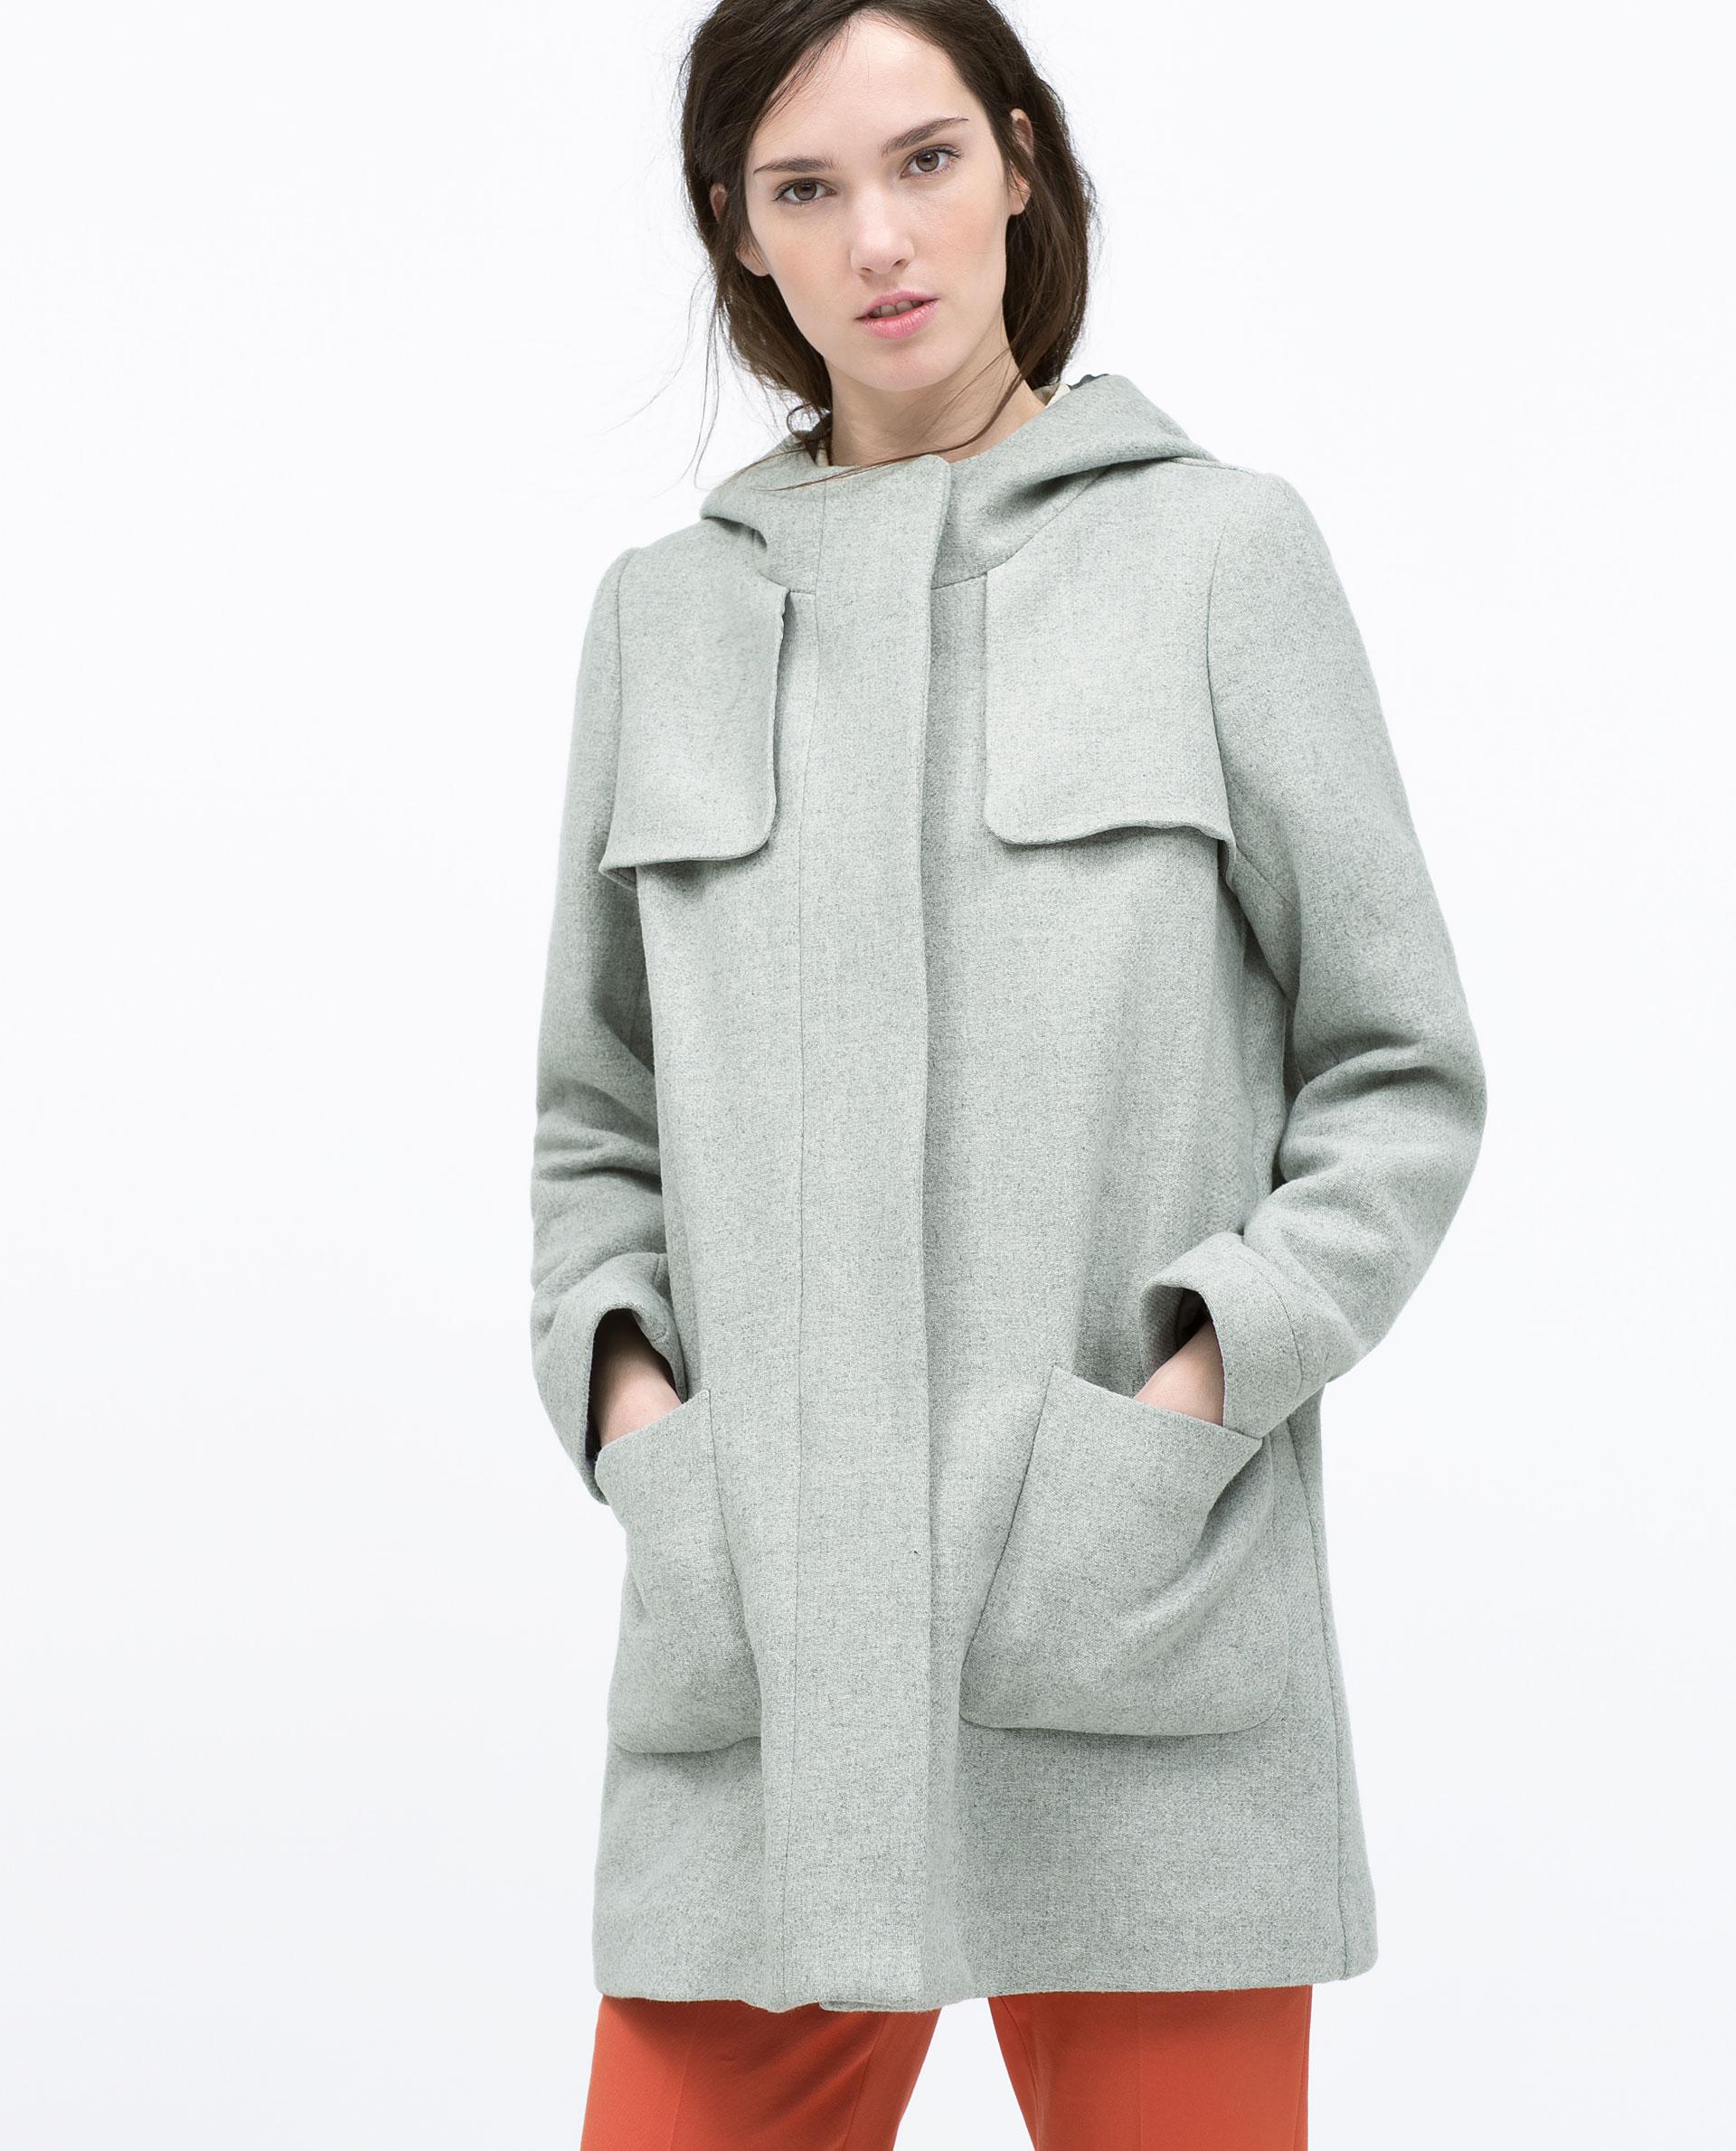 Zara Grey Wool Coat With Hood - Best Hood 2017